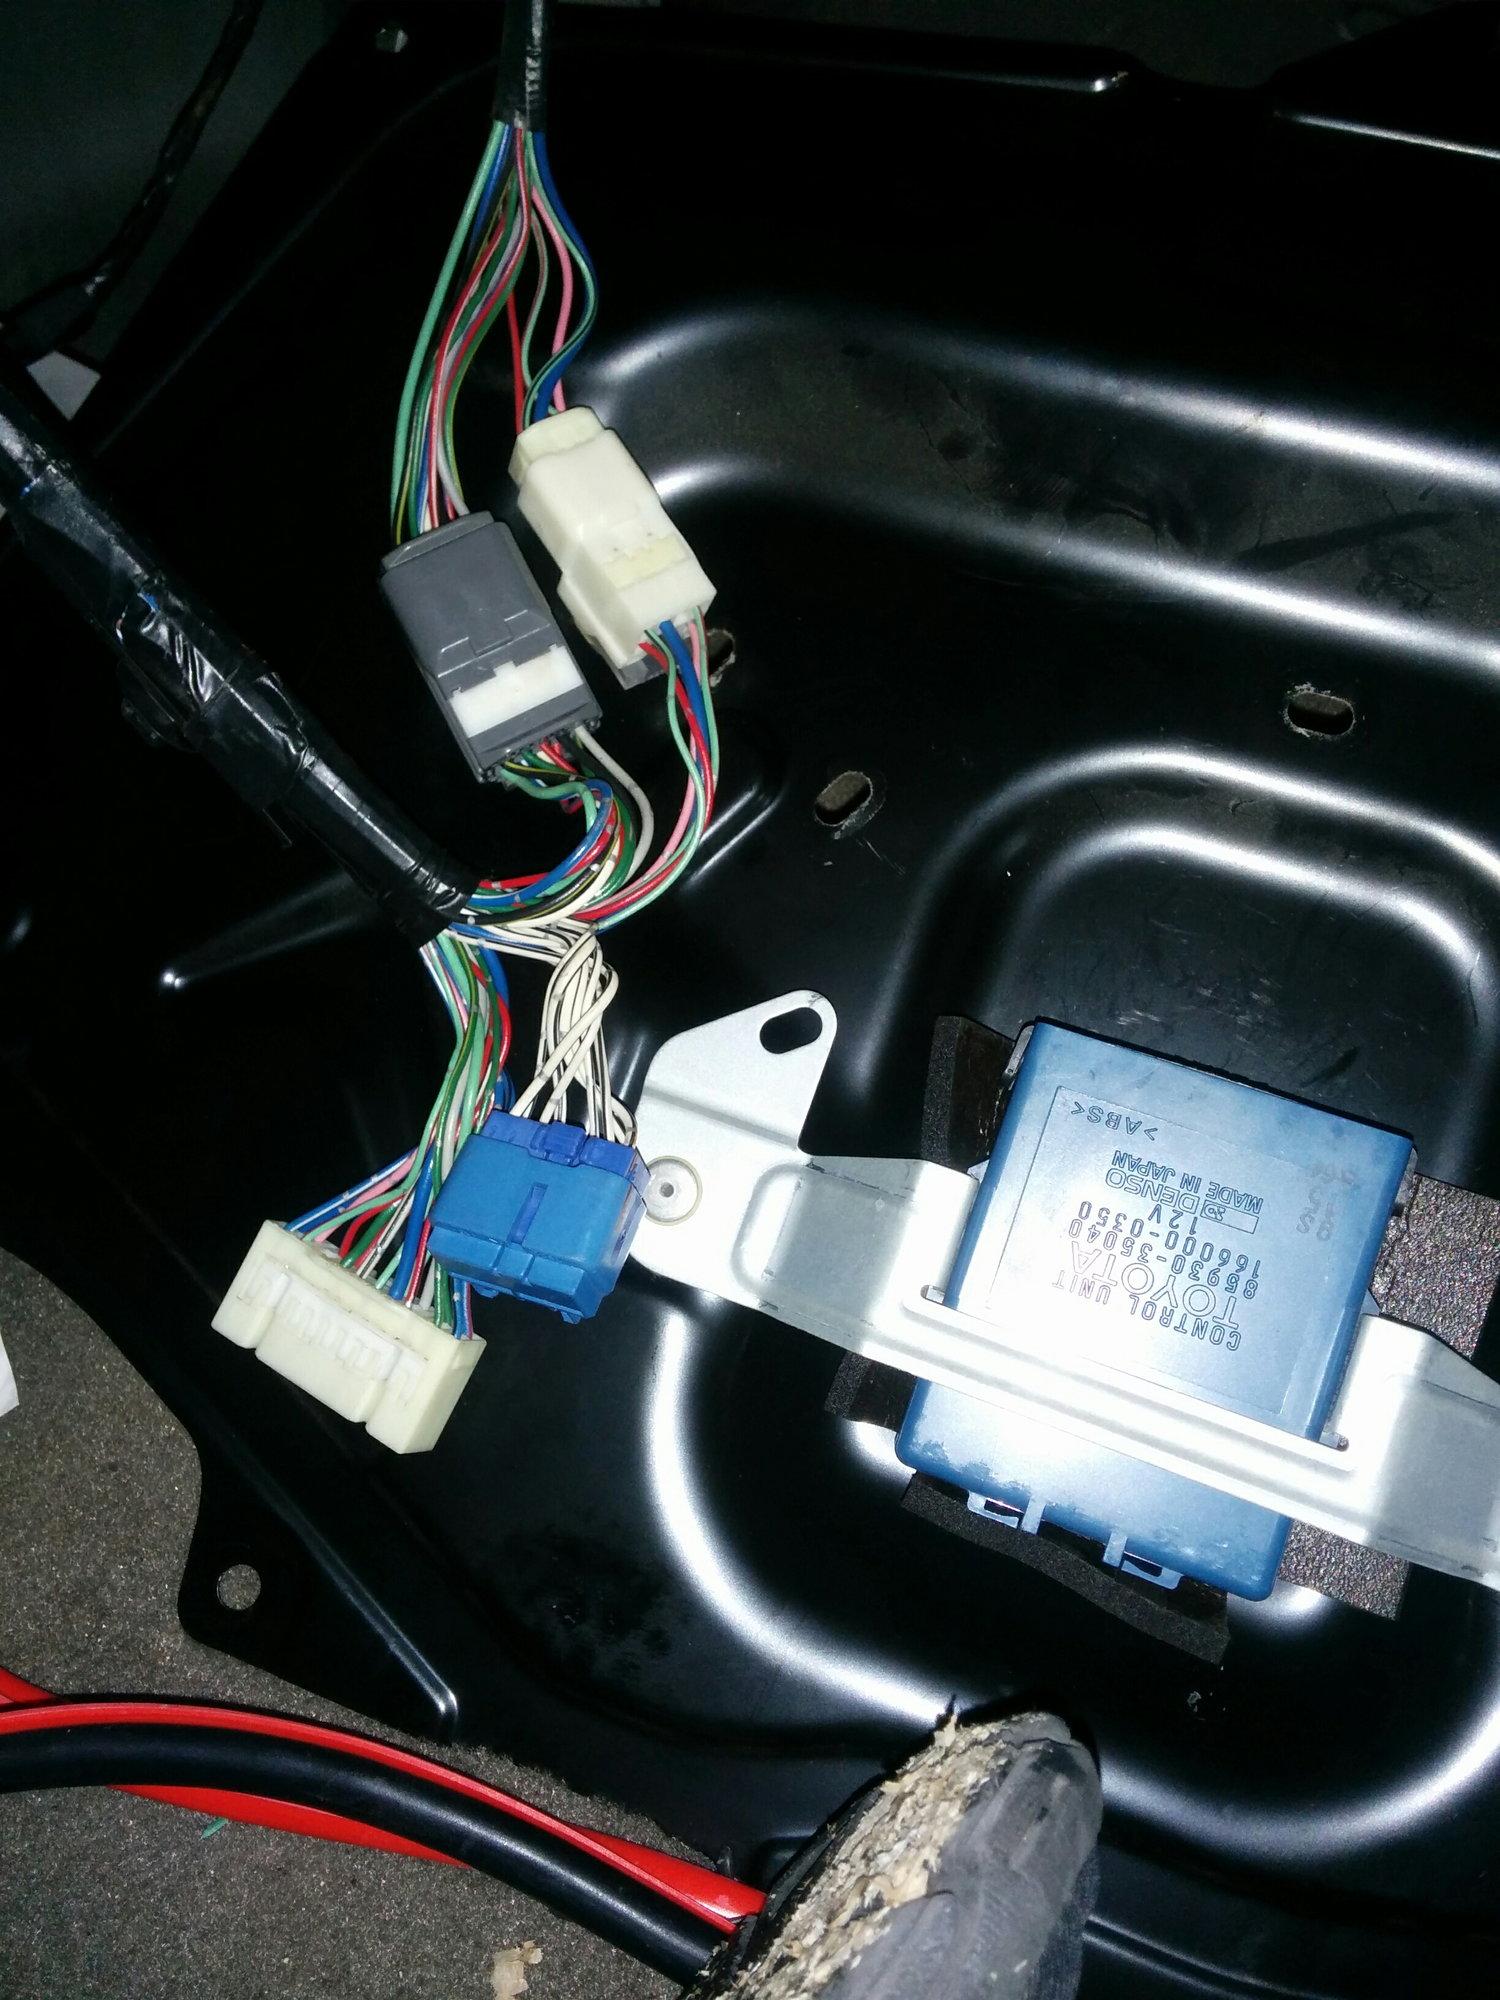 1998 4runner hatch wiring question (rear window, wipers ...